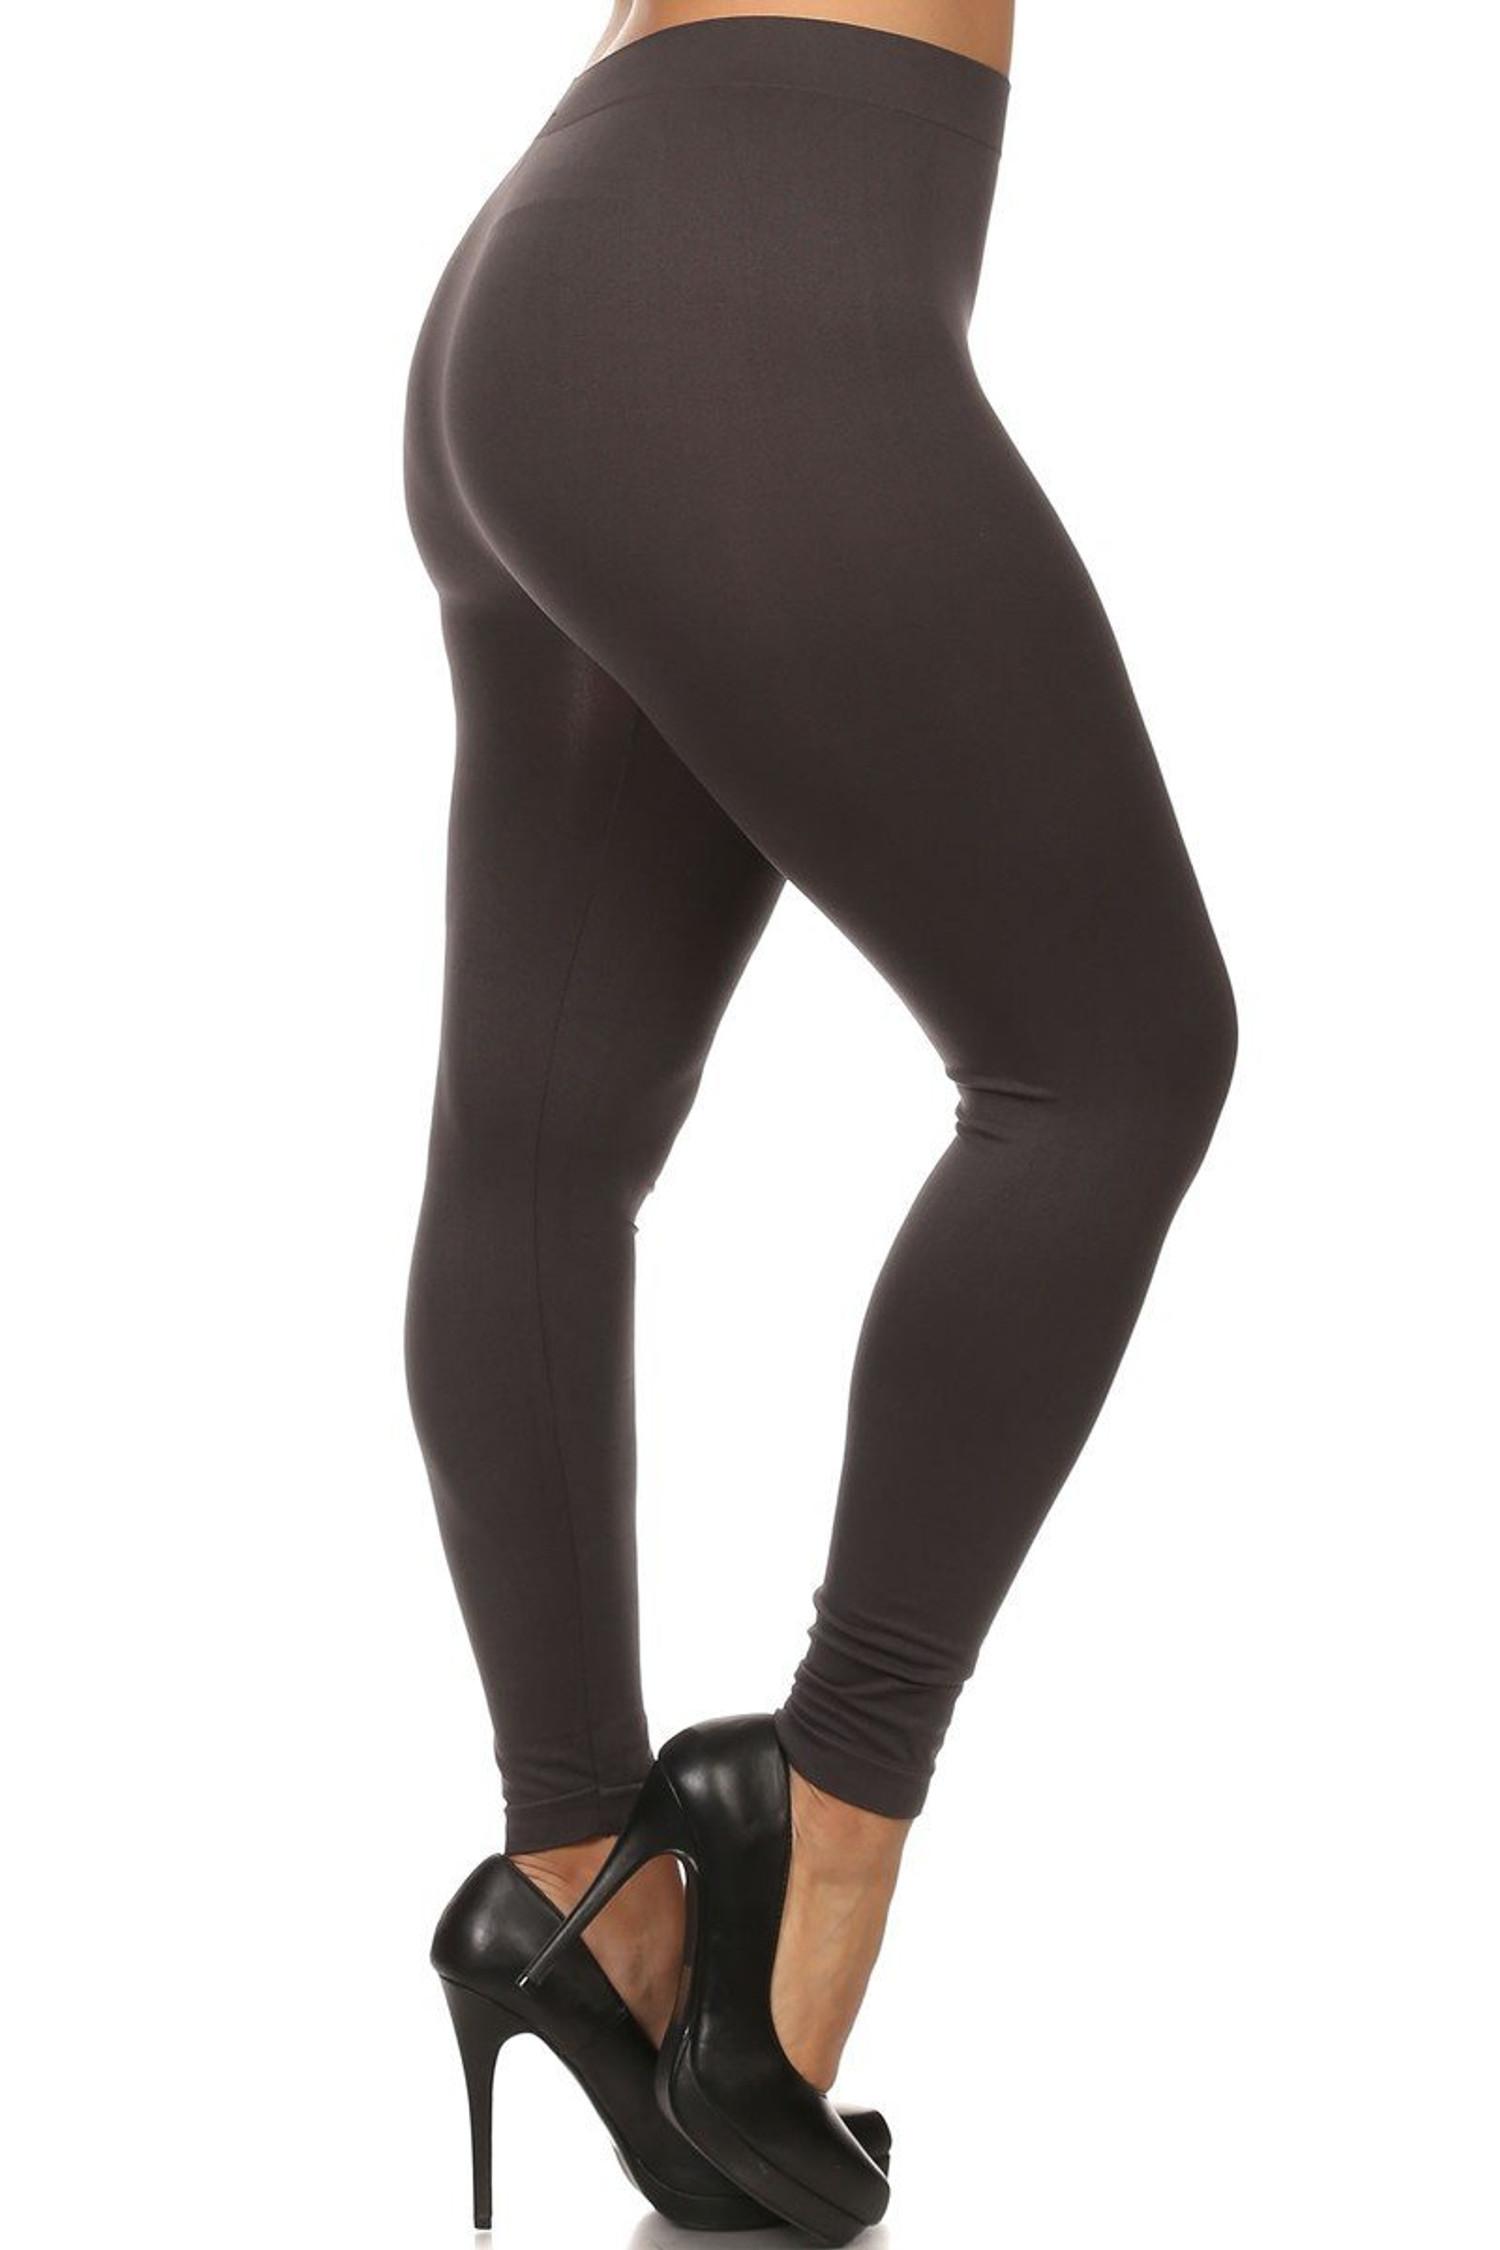 Charcoal Full Length Nylon Spandex Leggings - Plus Size